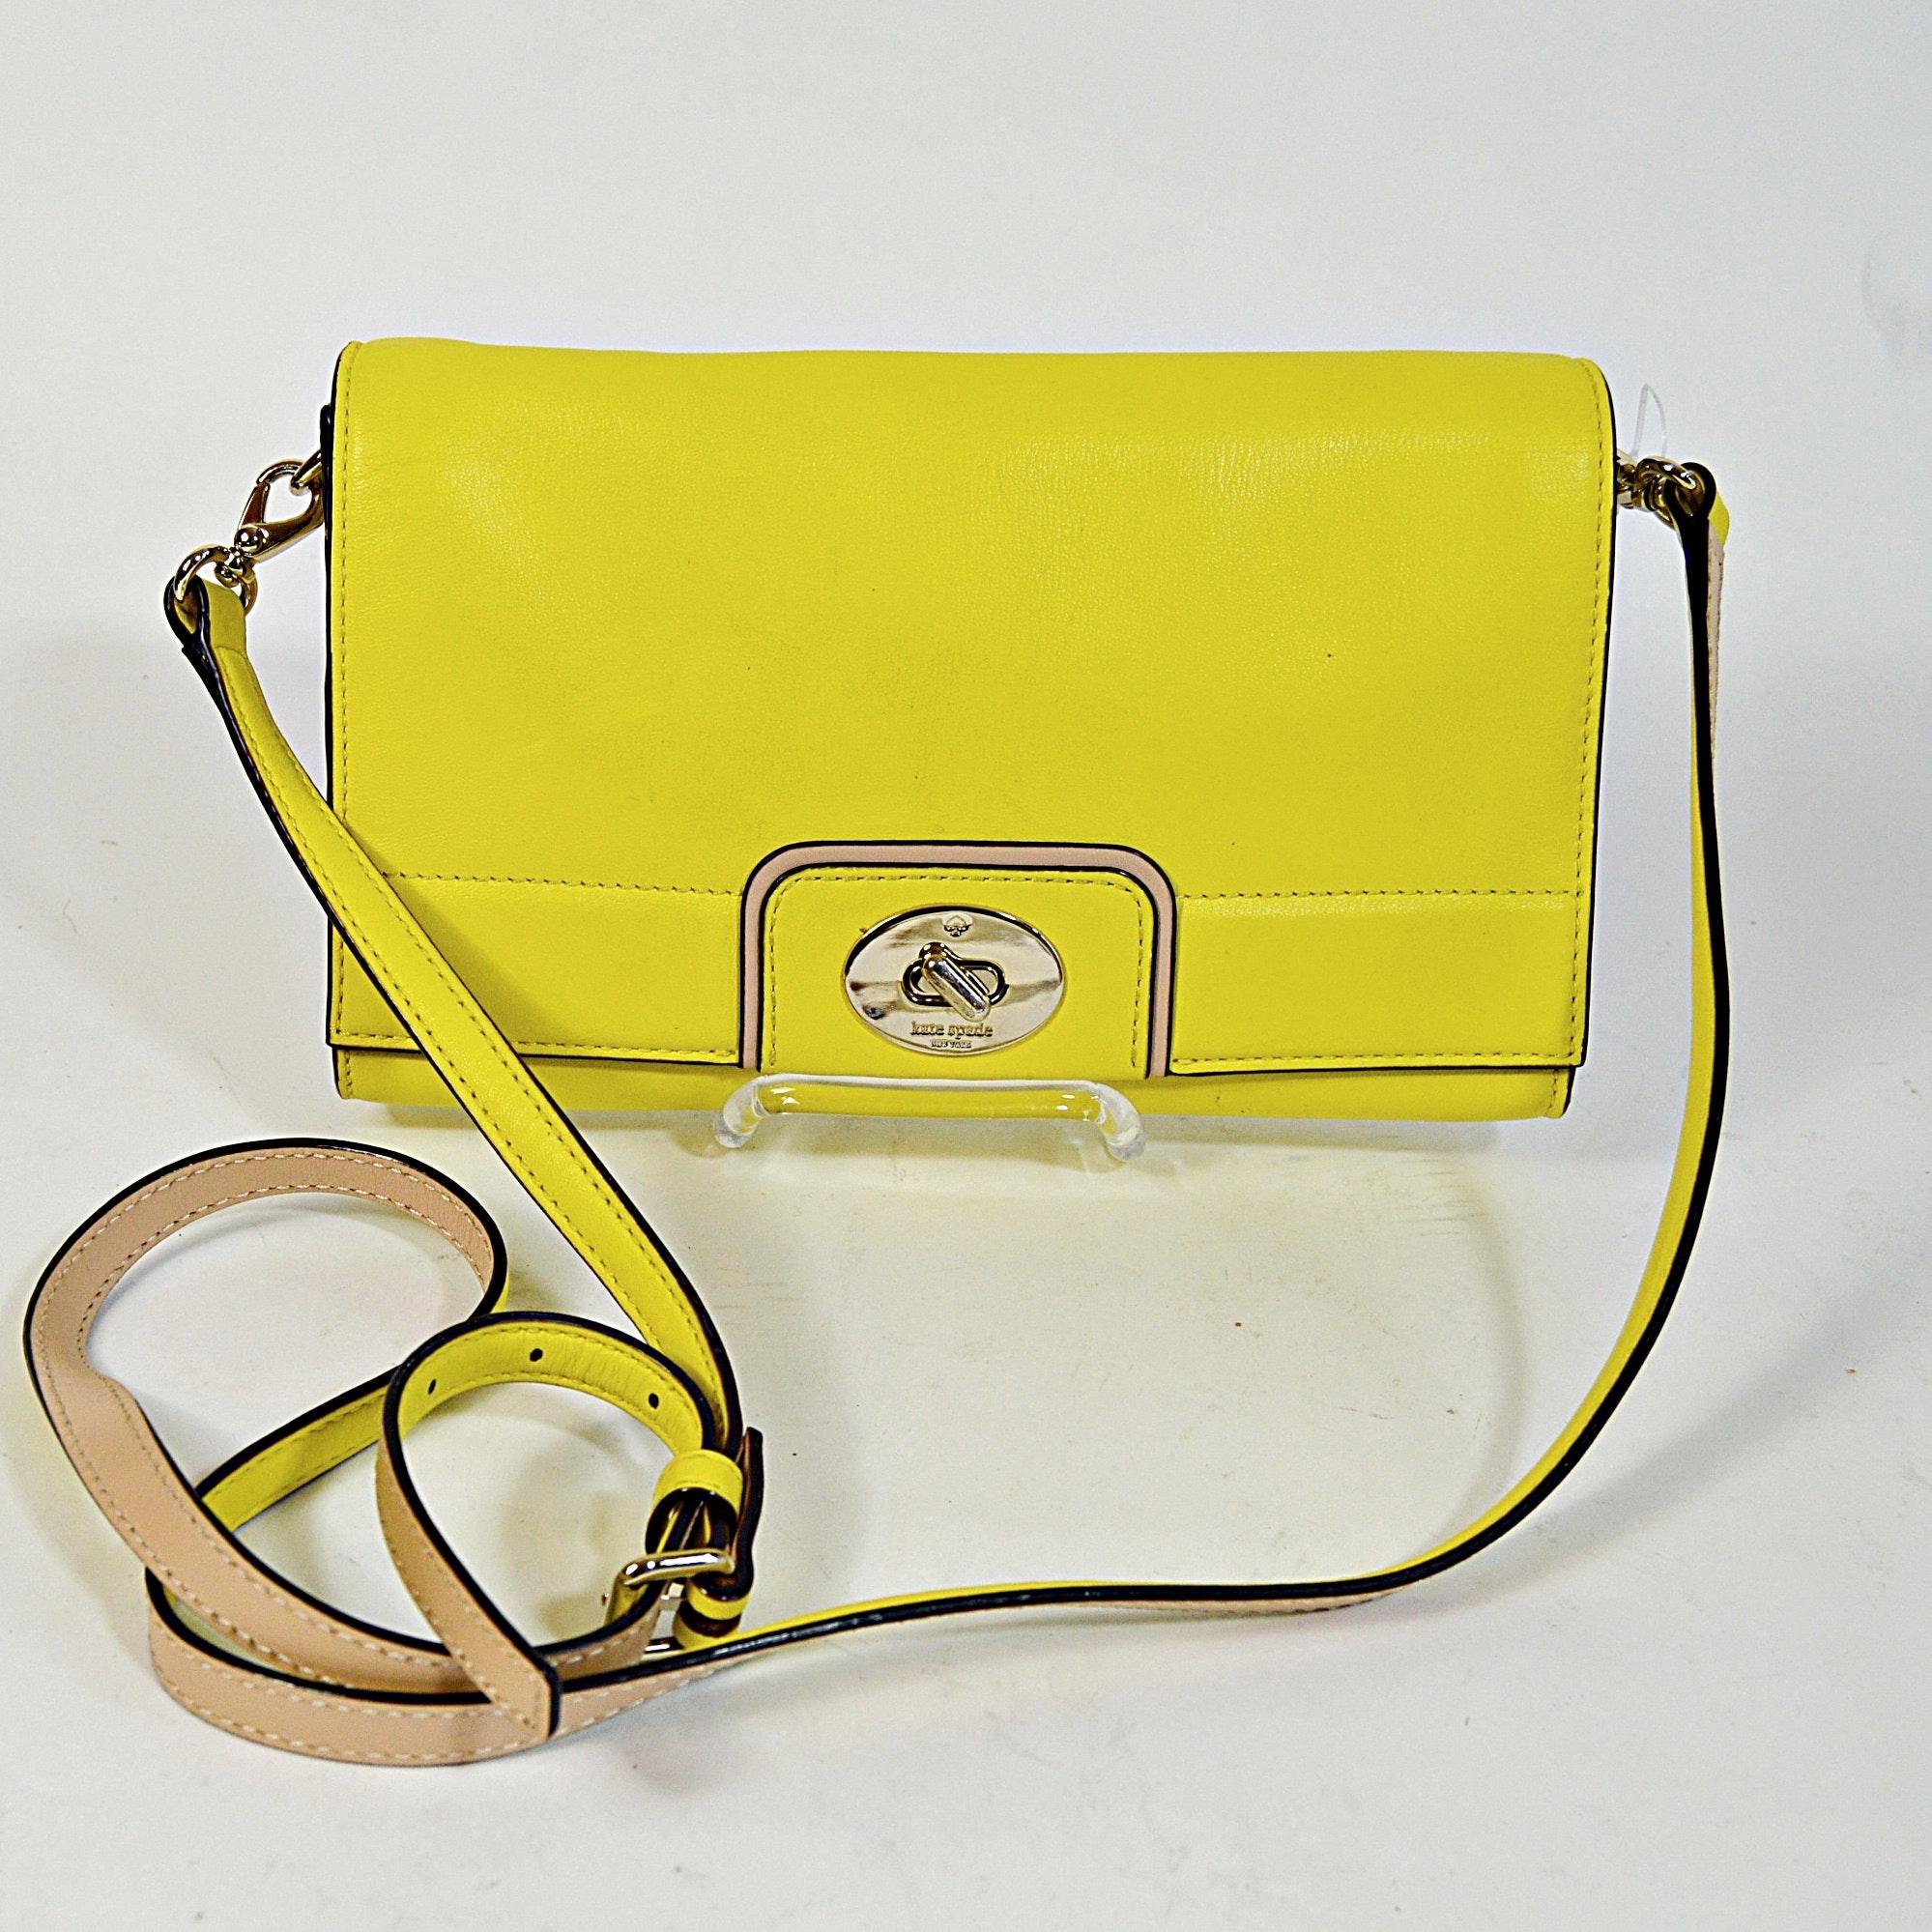 Kate Spade New York Hampton Road Juliana Crossbody Bag